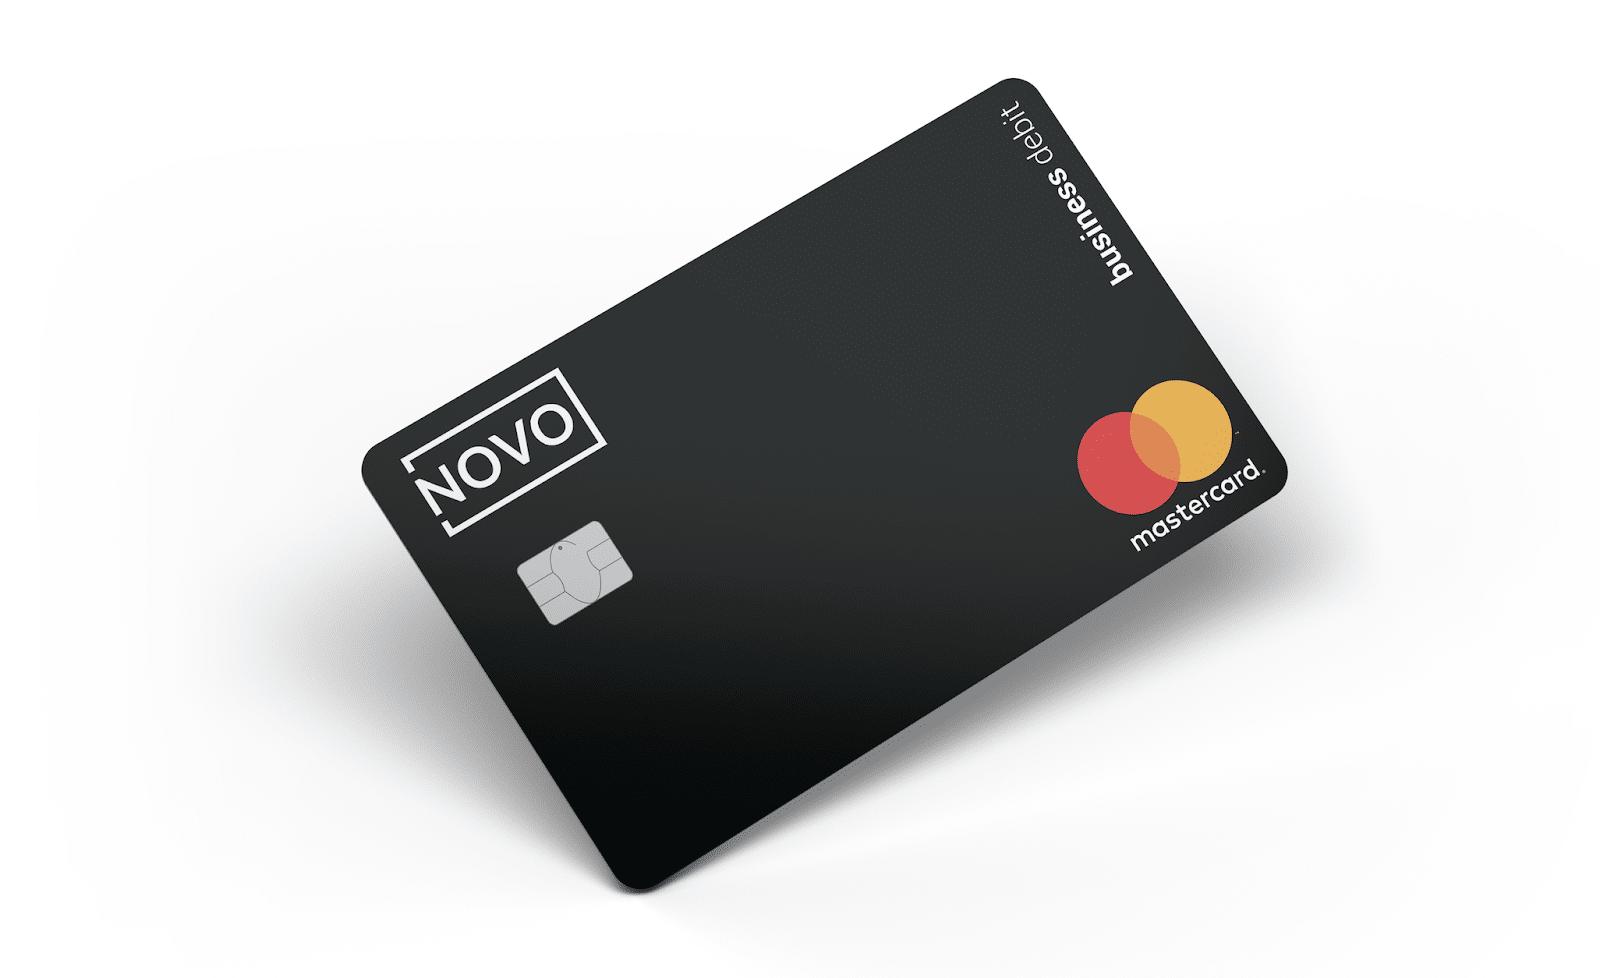 novo bank debit card